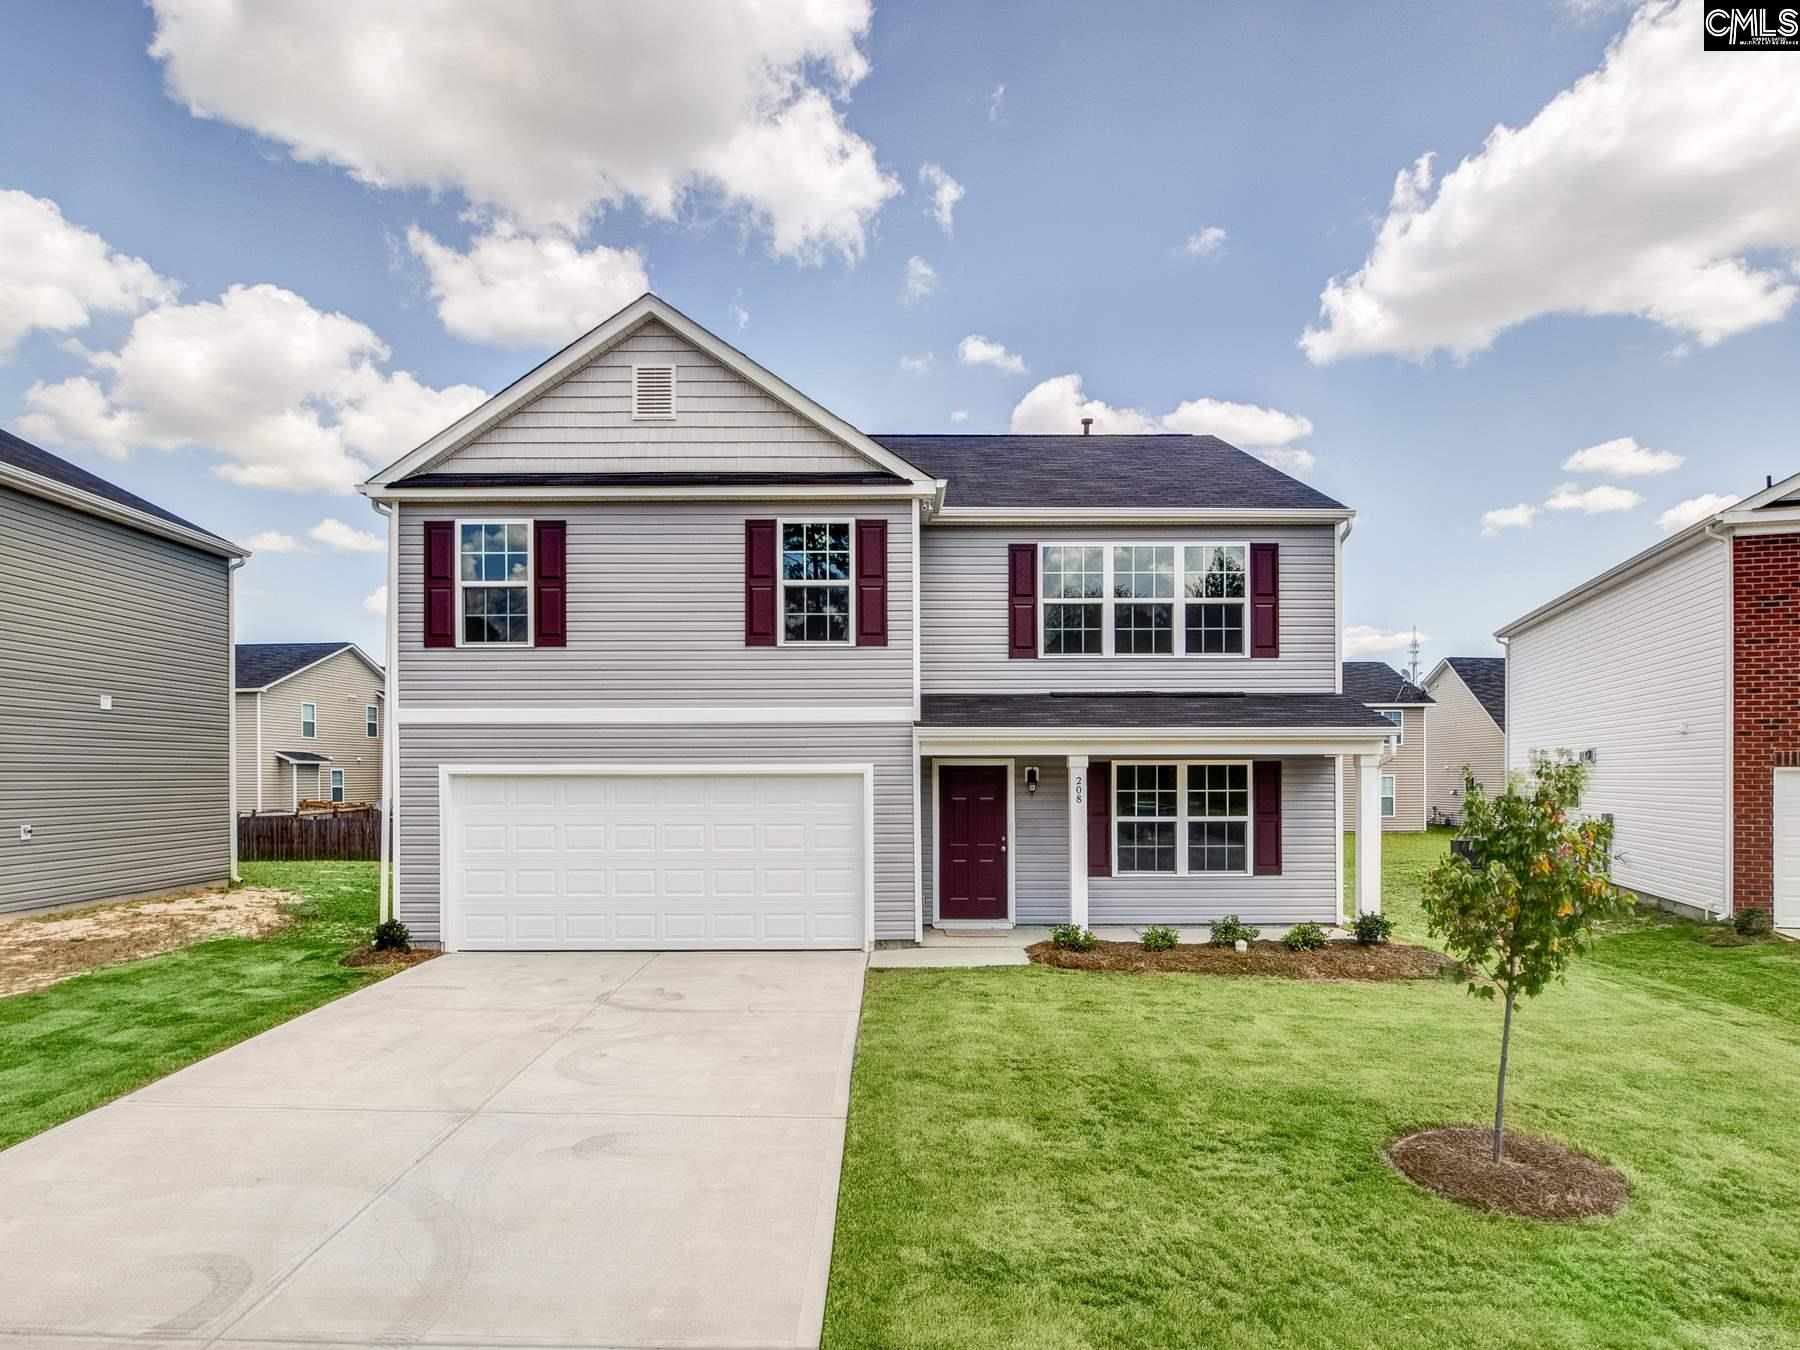 635 Twisted Oak #Lot 267 Lexington, SC 29073